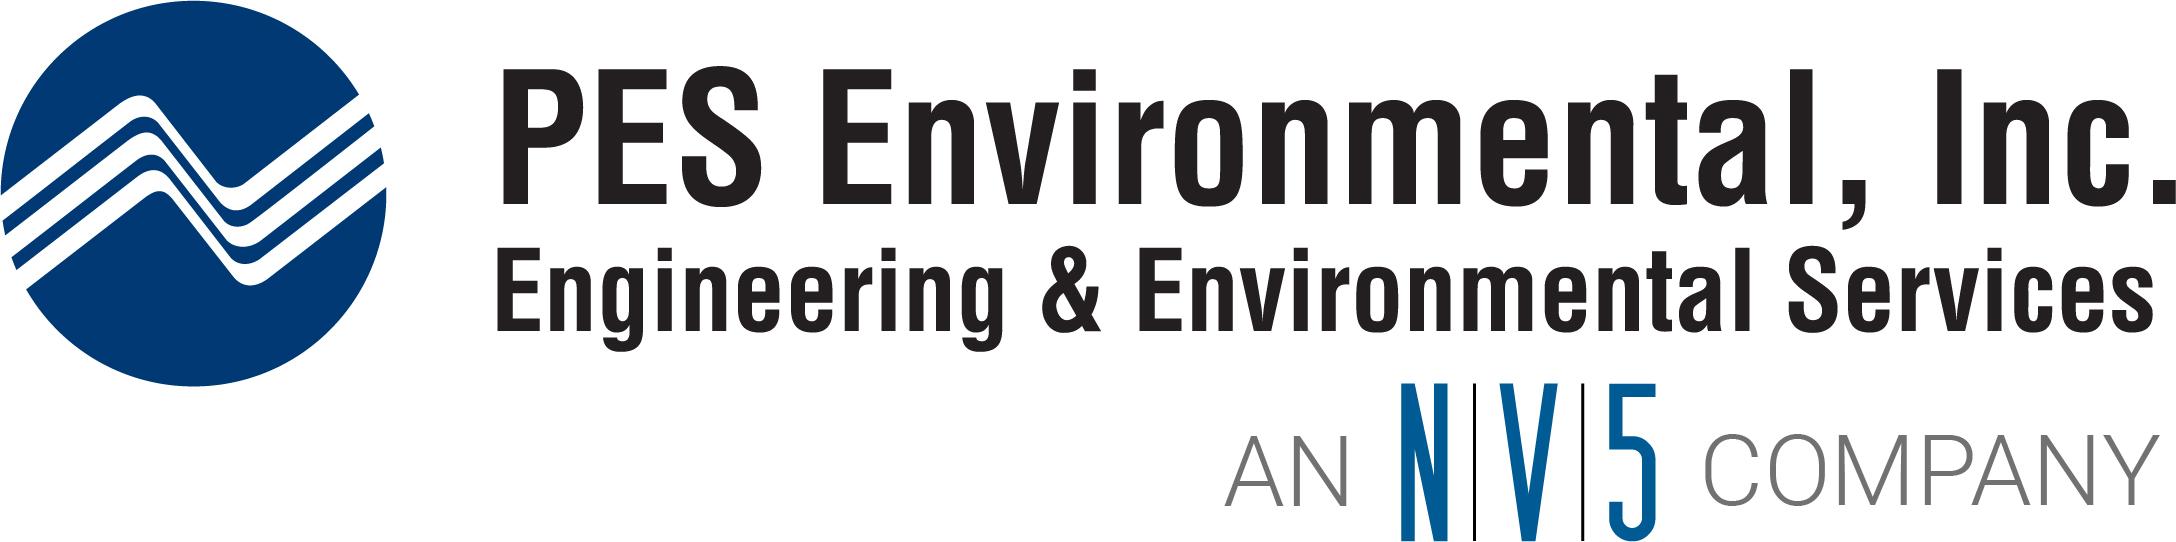 PES Environmental, Inc. An NV5 Company